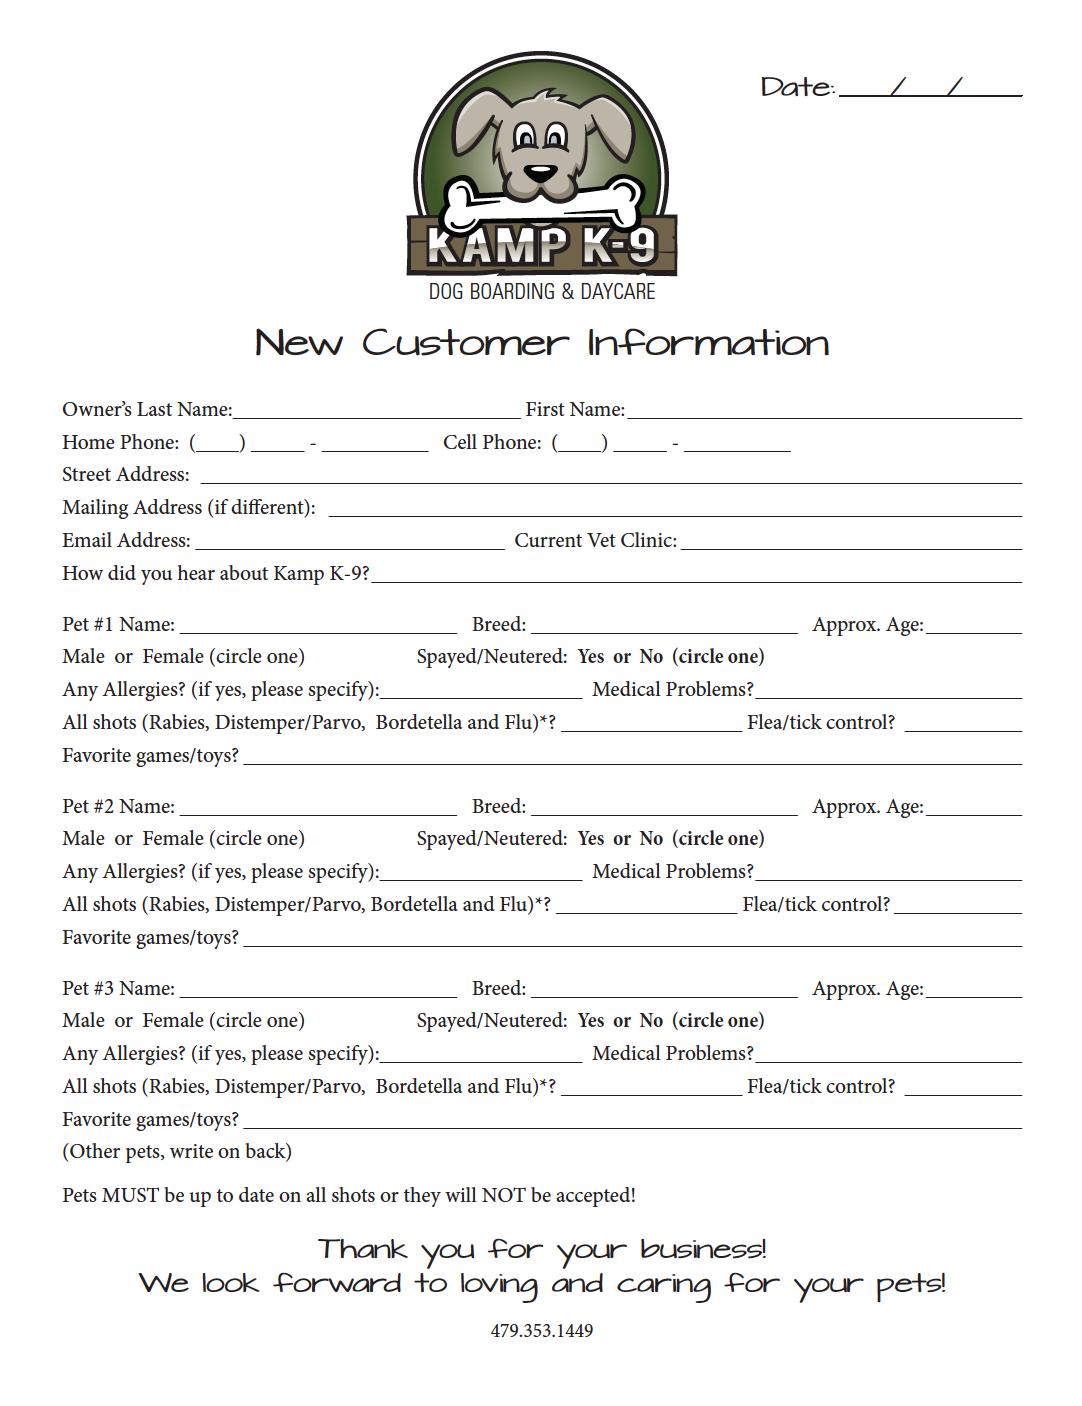 New Customer Information